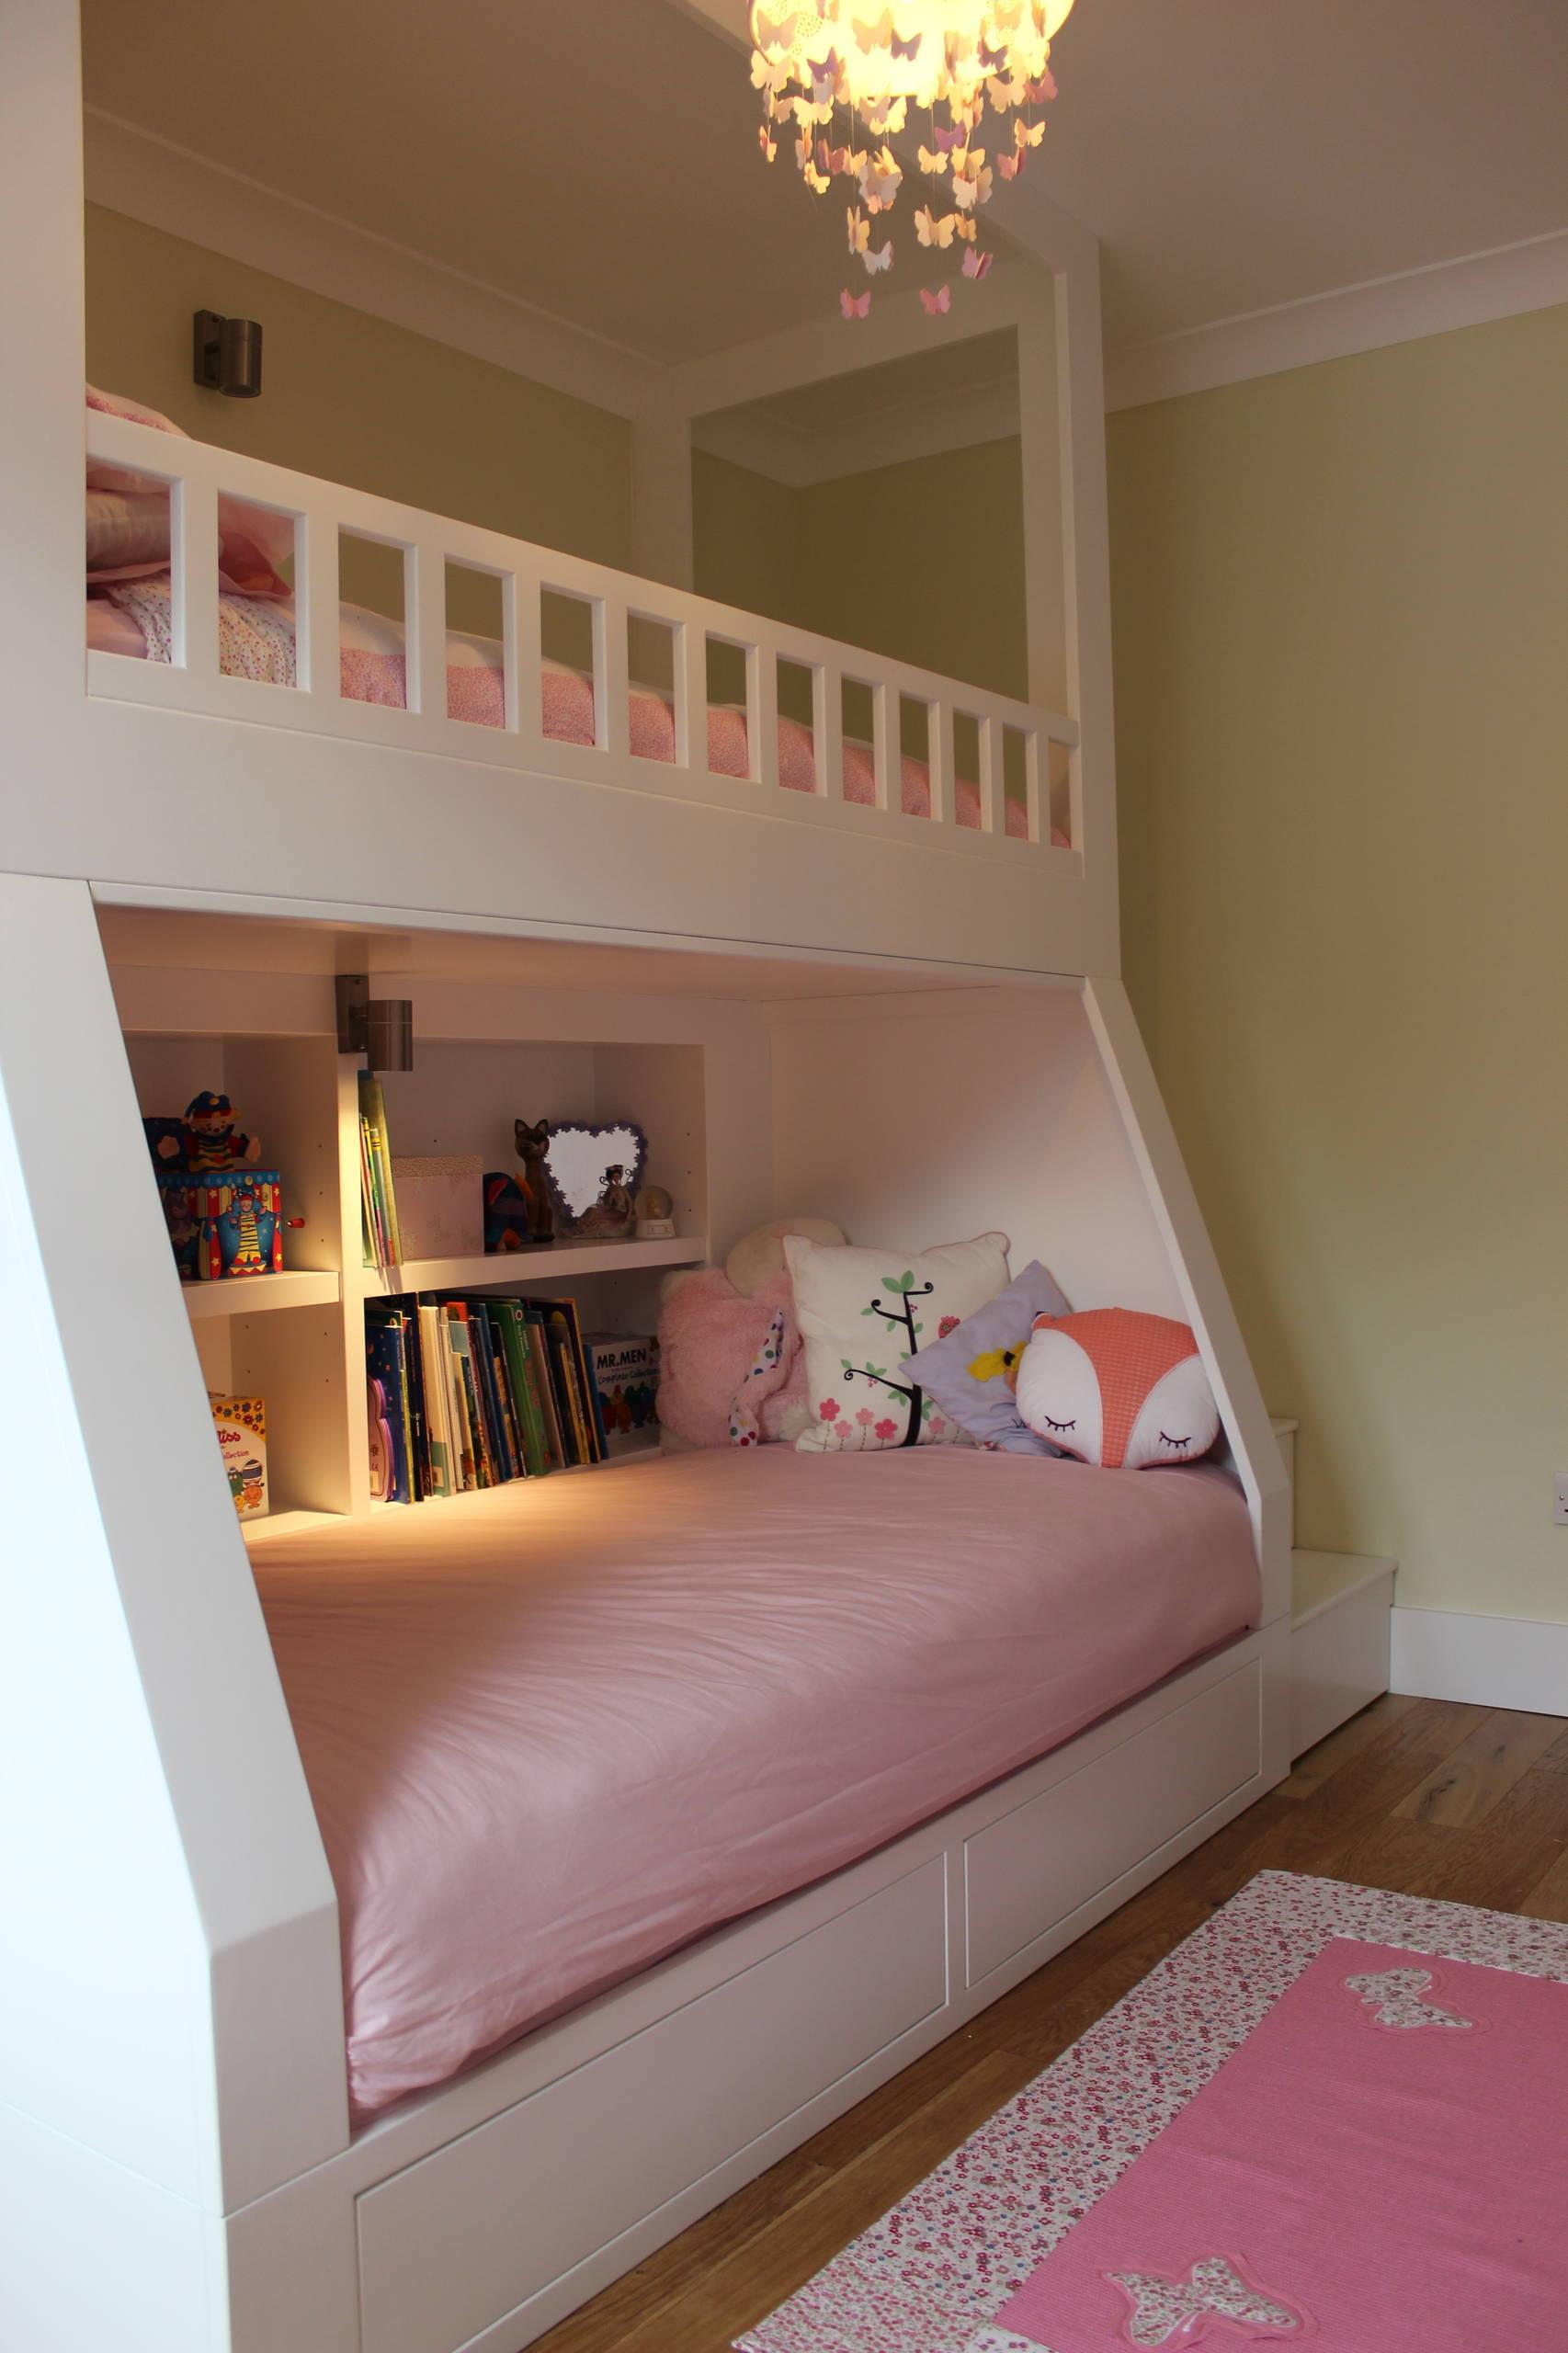 6 Year Old Girls Bedroom Ideas & Photos  Houzz